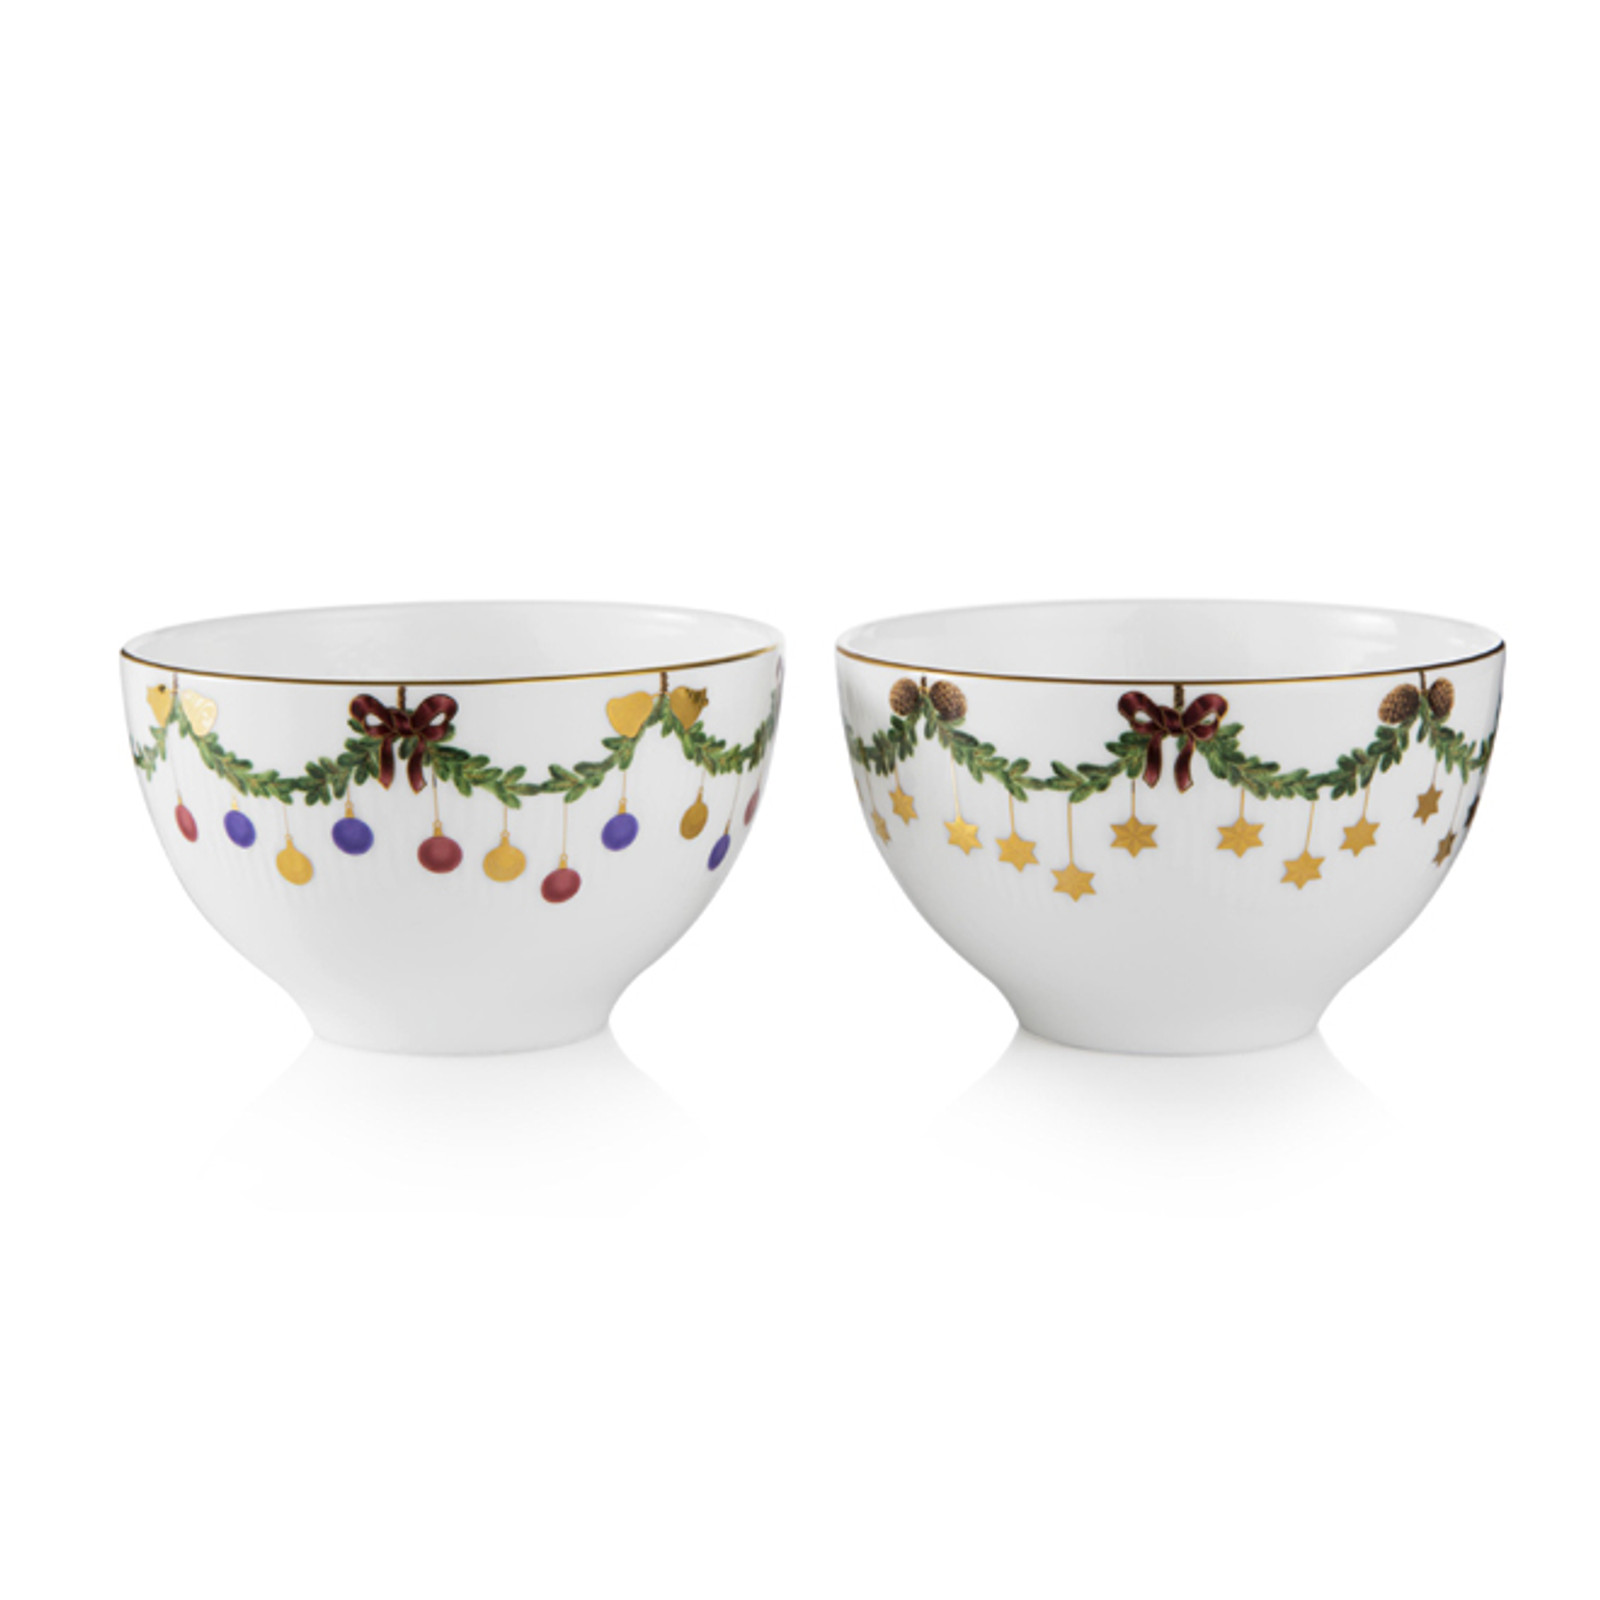 Royal Copenhagen Star Fluted Christmas Chocolate Bowls